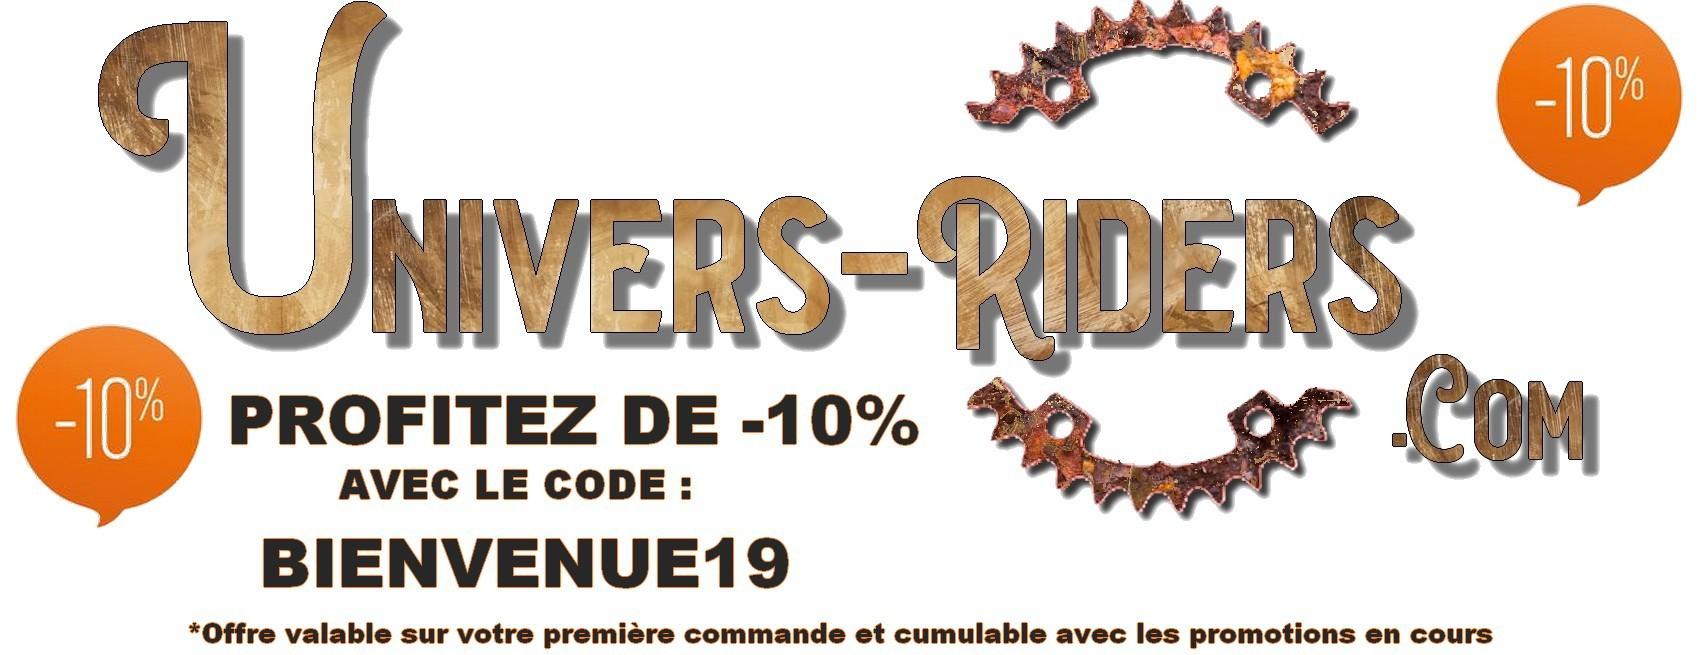 Bienvenue chez univers-riders.com